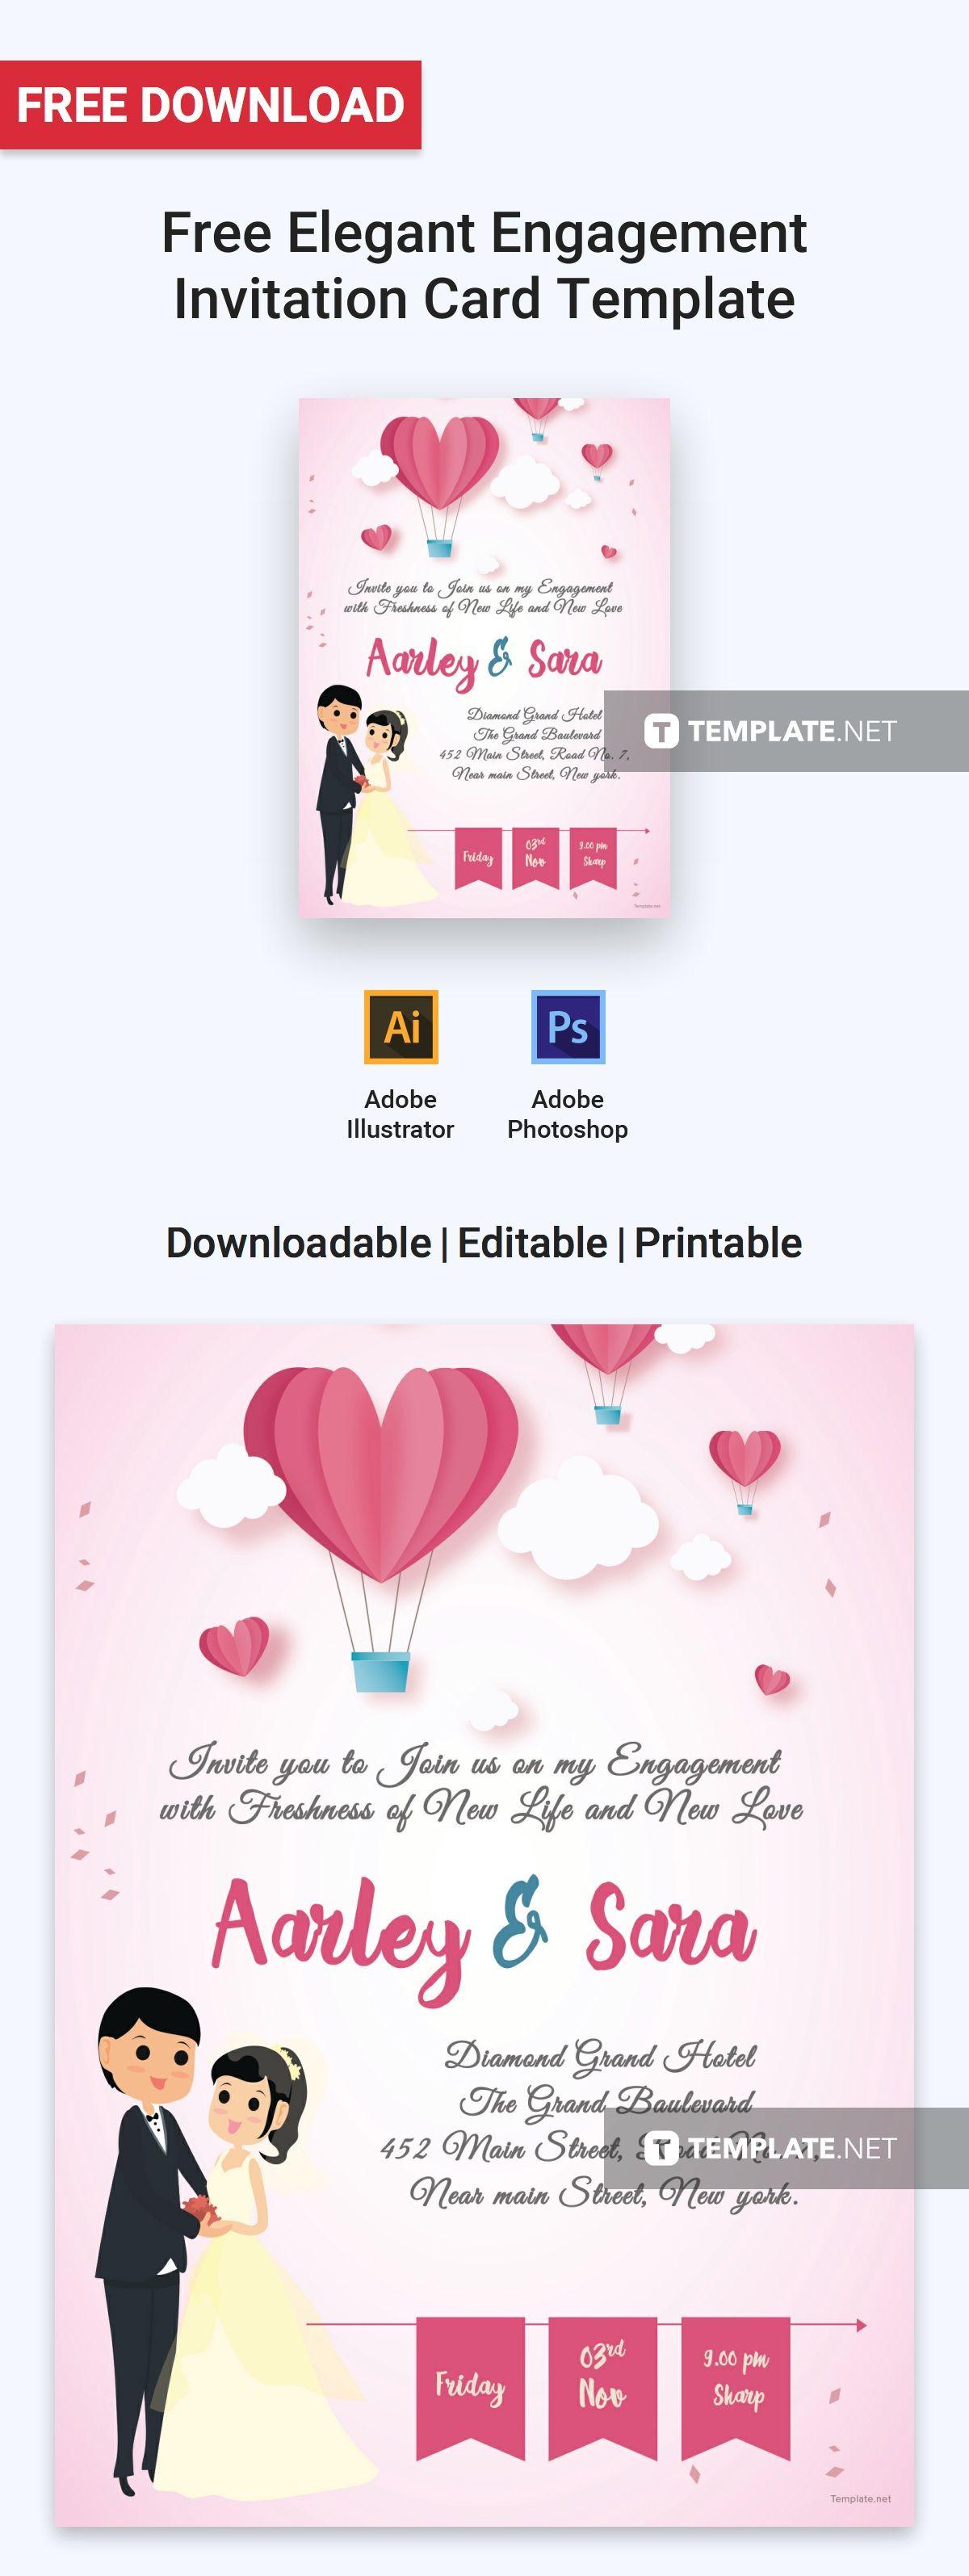 Free Elegant Engagement Invitation Card | Printables, Invitations ...